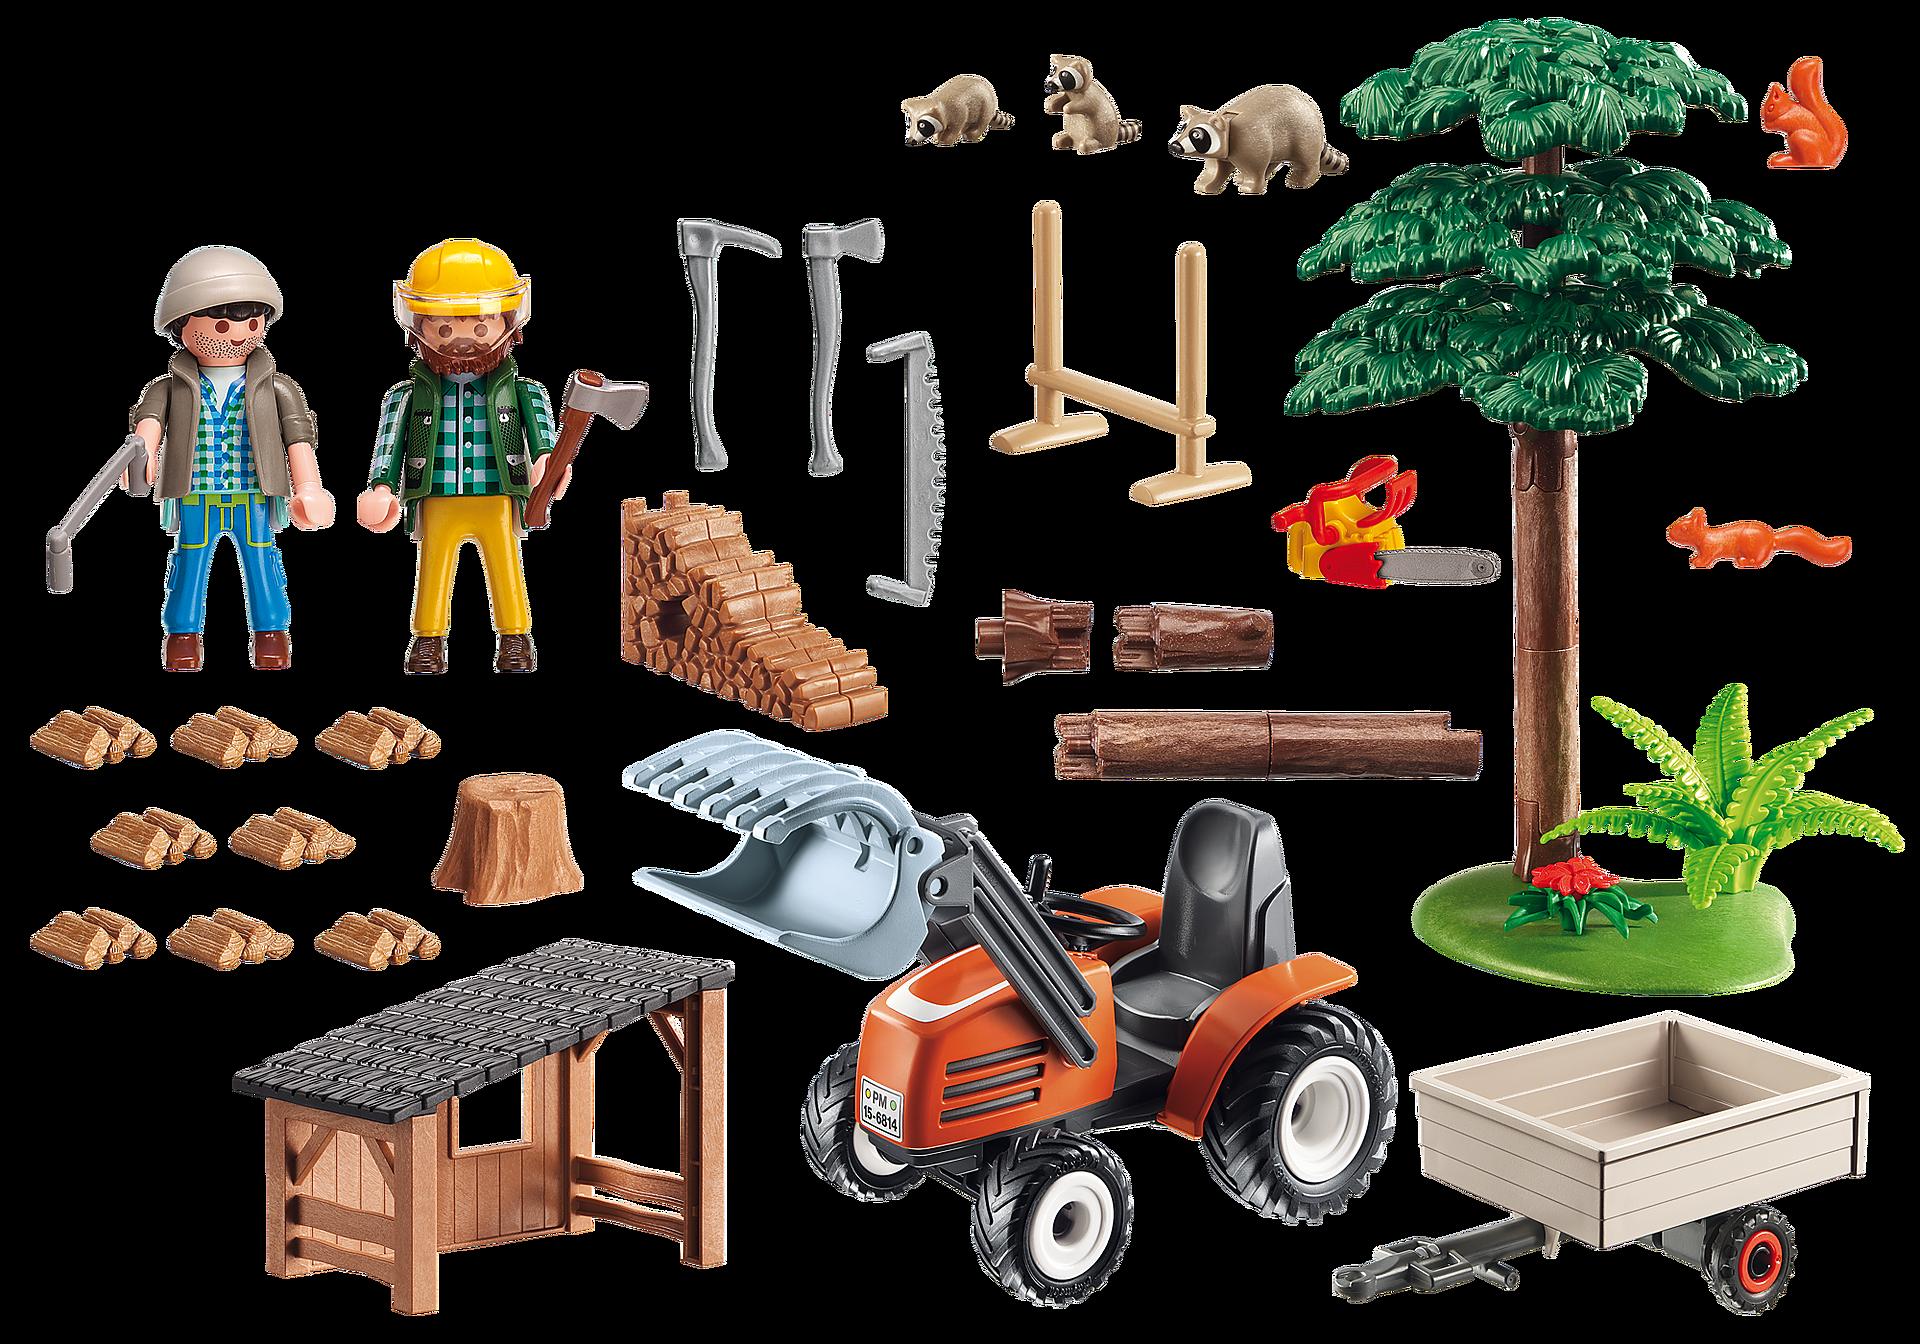 6814 Holzfäller mit Traktor zoom image4